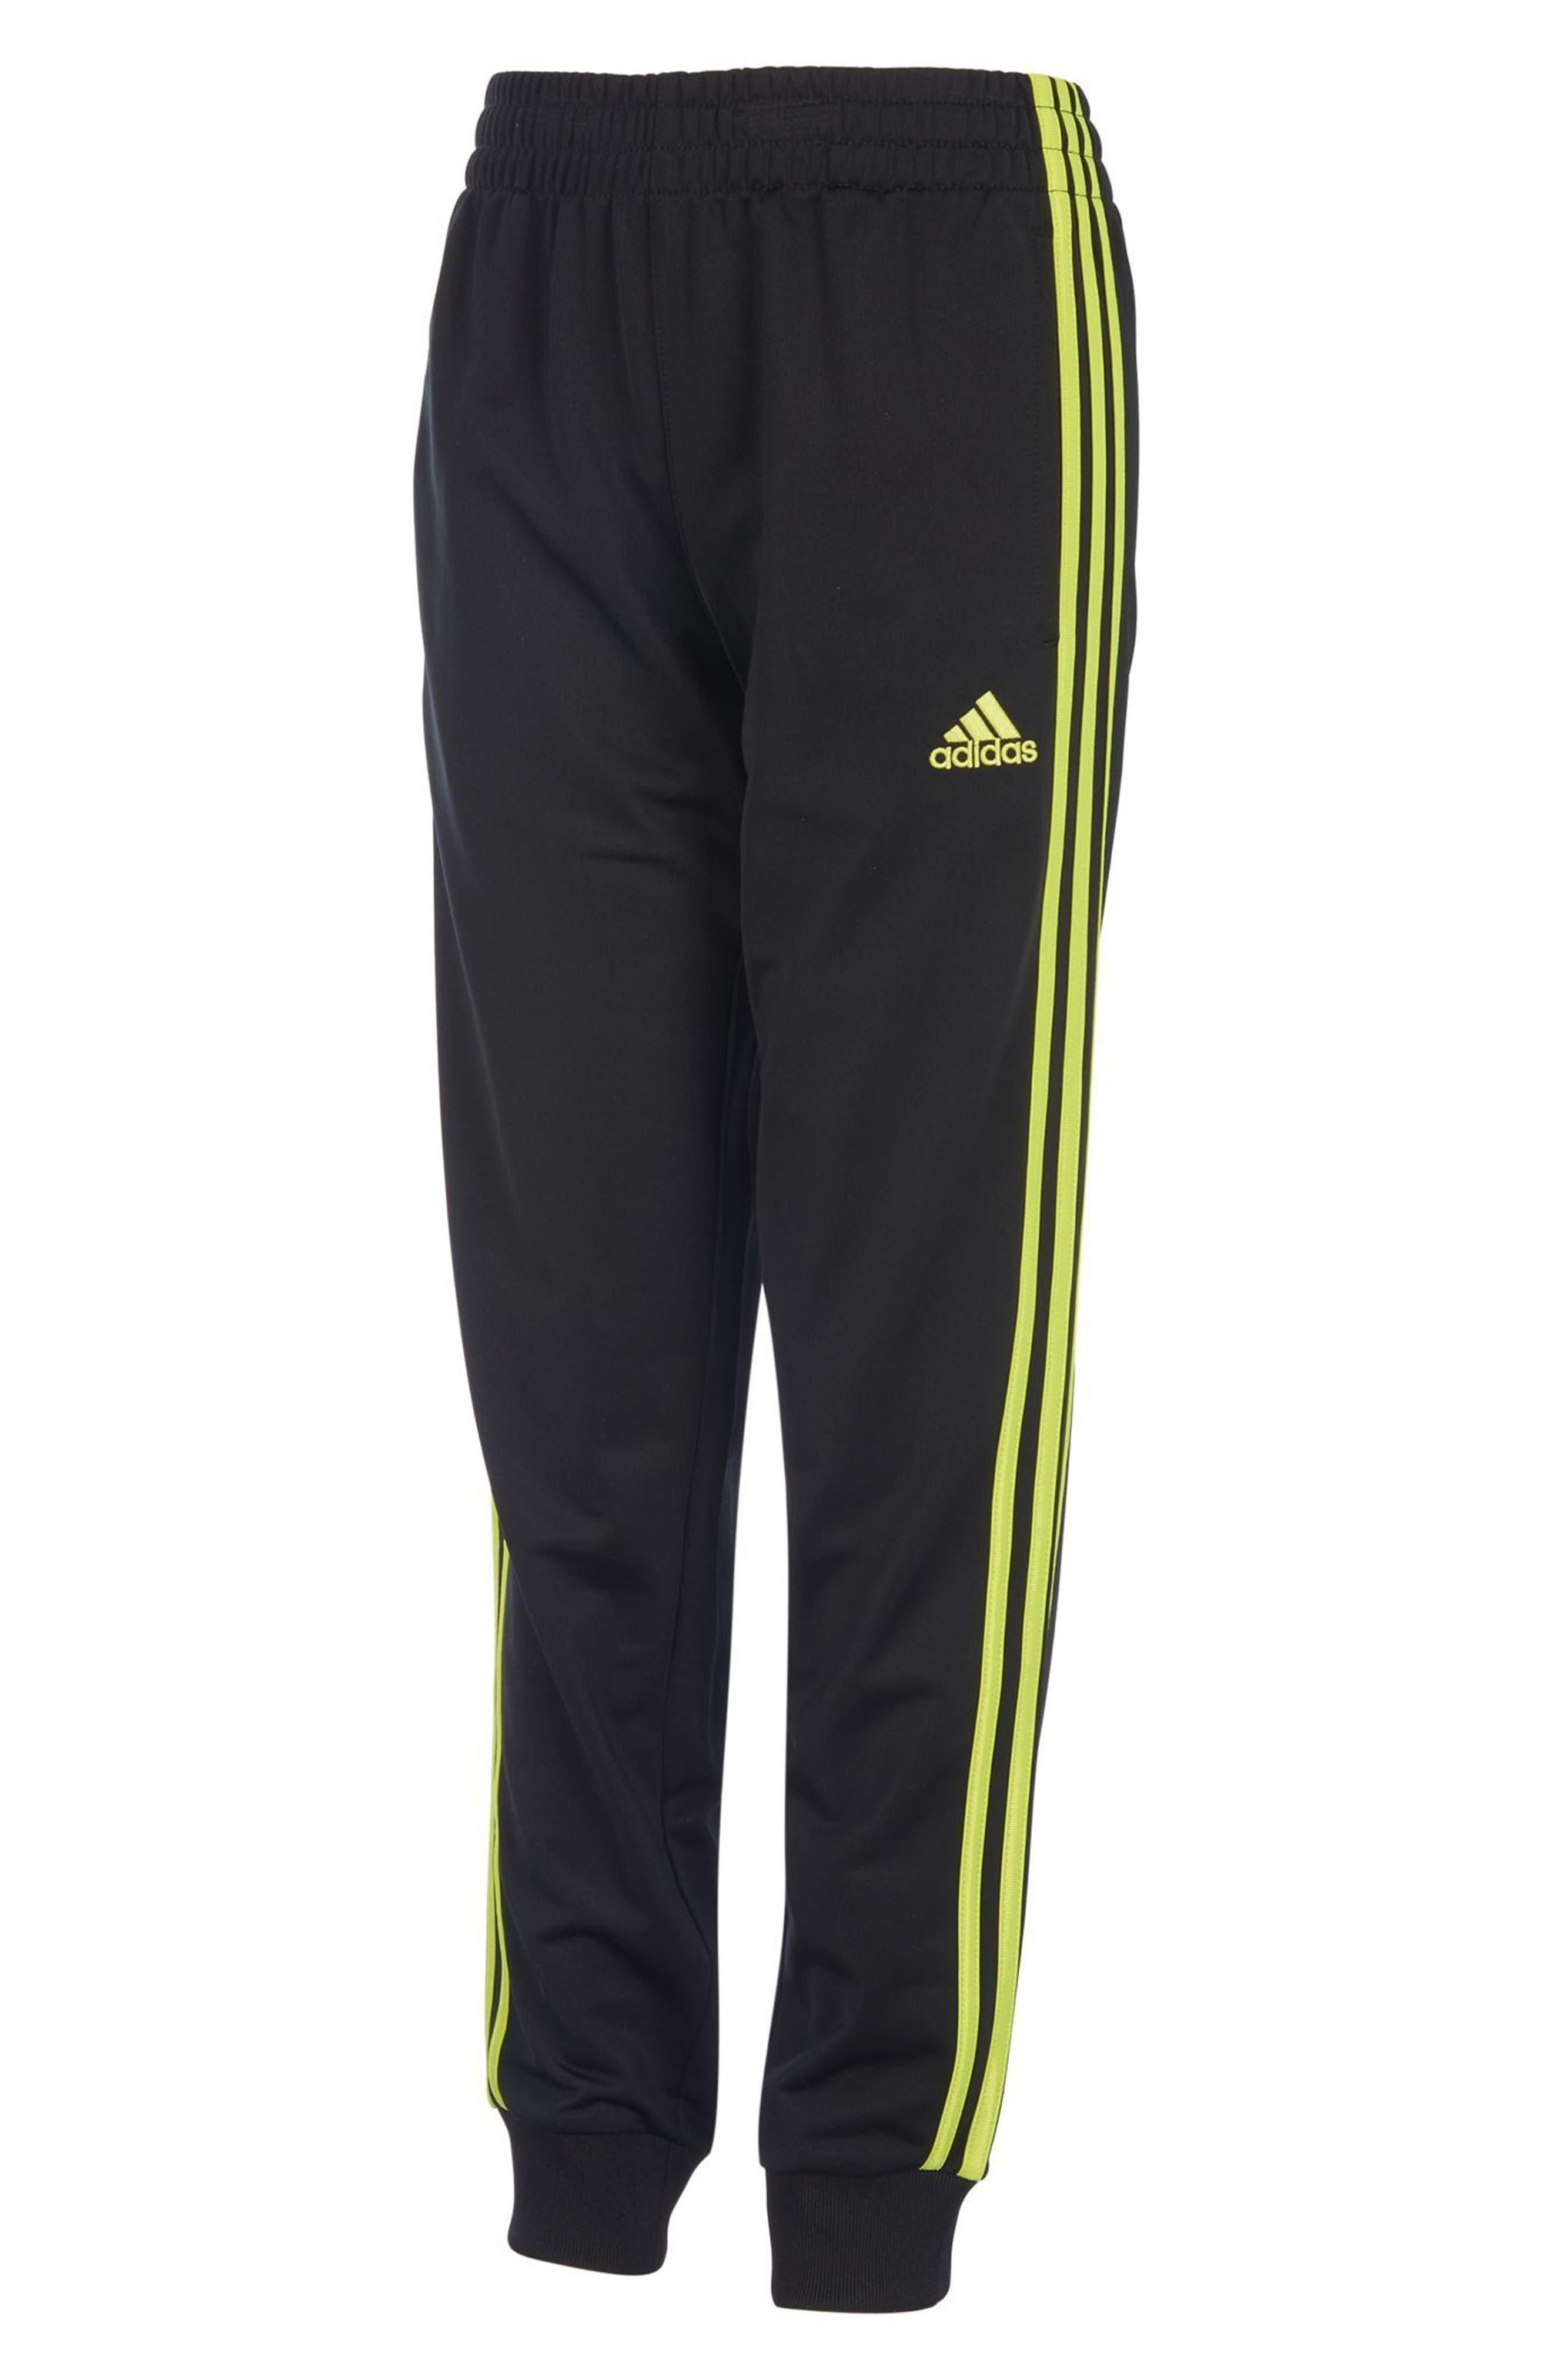 Iconic Jogger Pants,                         Main,                         color, Black/ Yellow